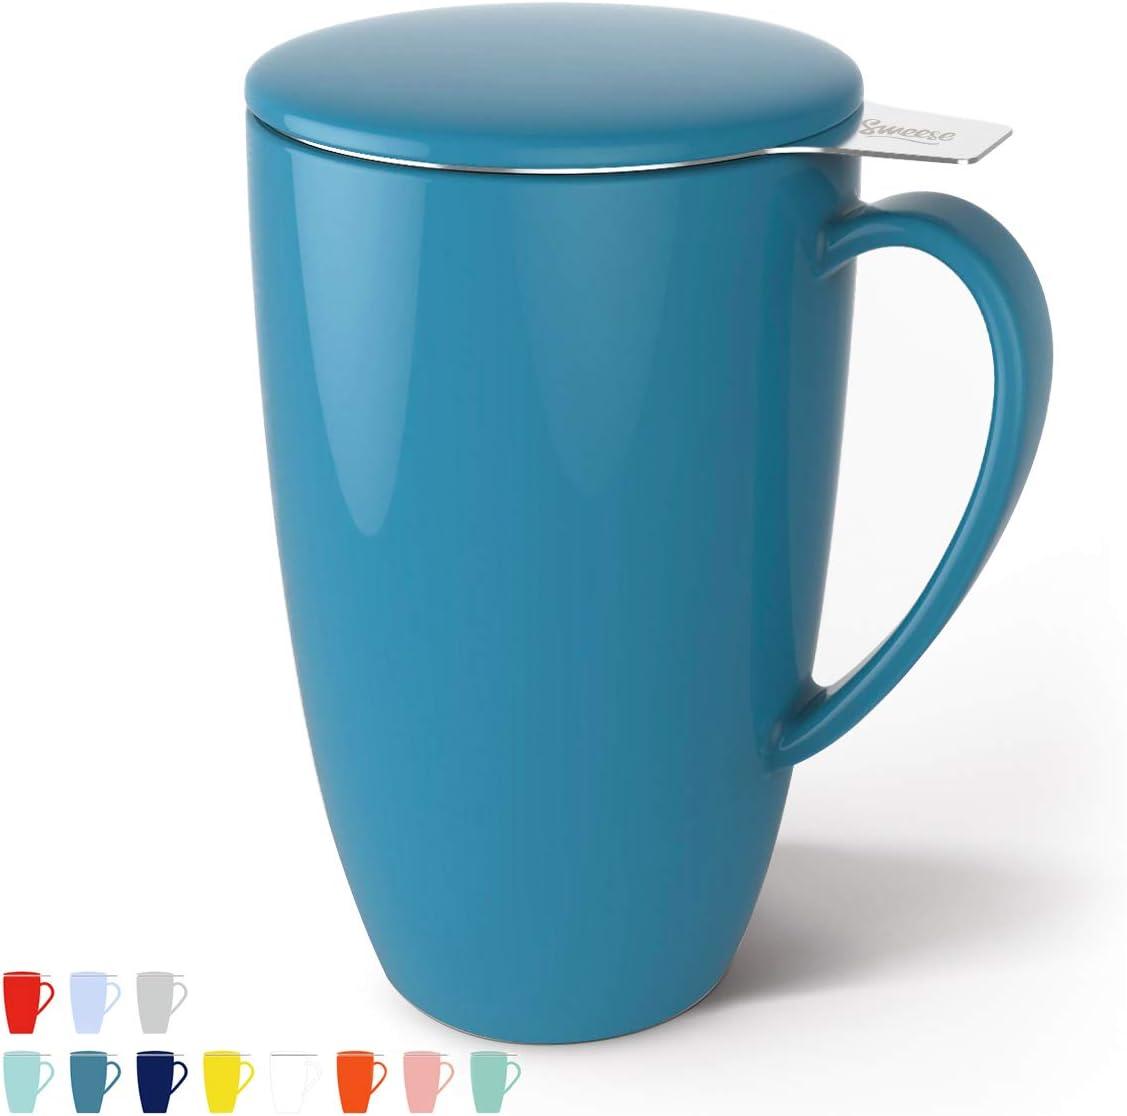 Taza Sweese de cer/ámica//porcelana/con tapa y filtro para t/é acero inoxidable 400/ml Turquesa de acero inoxidable